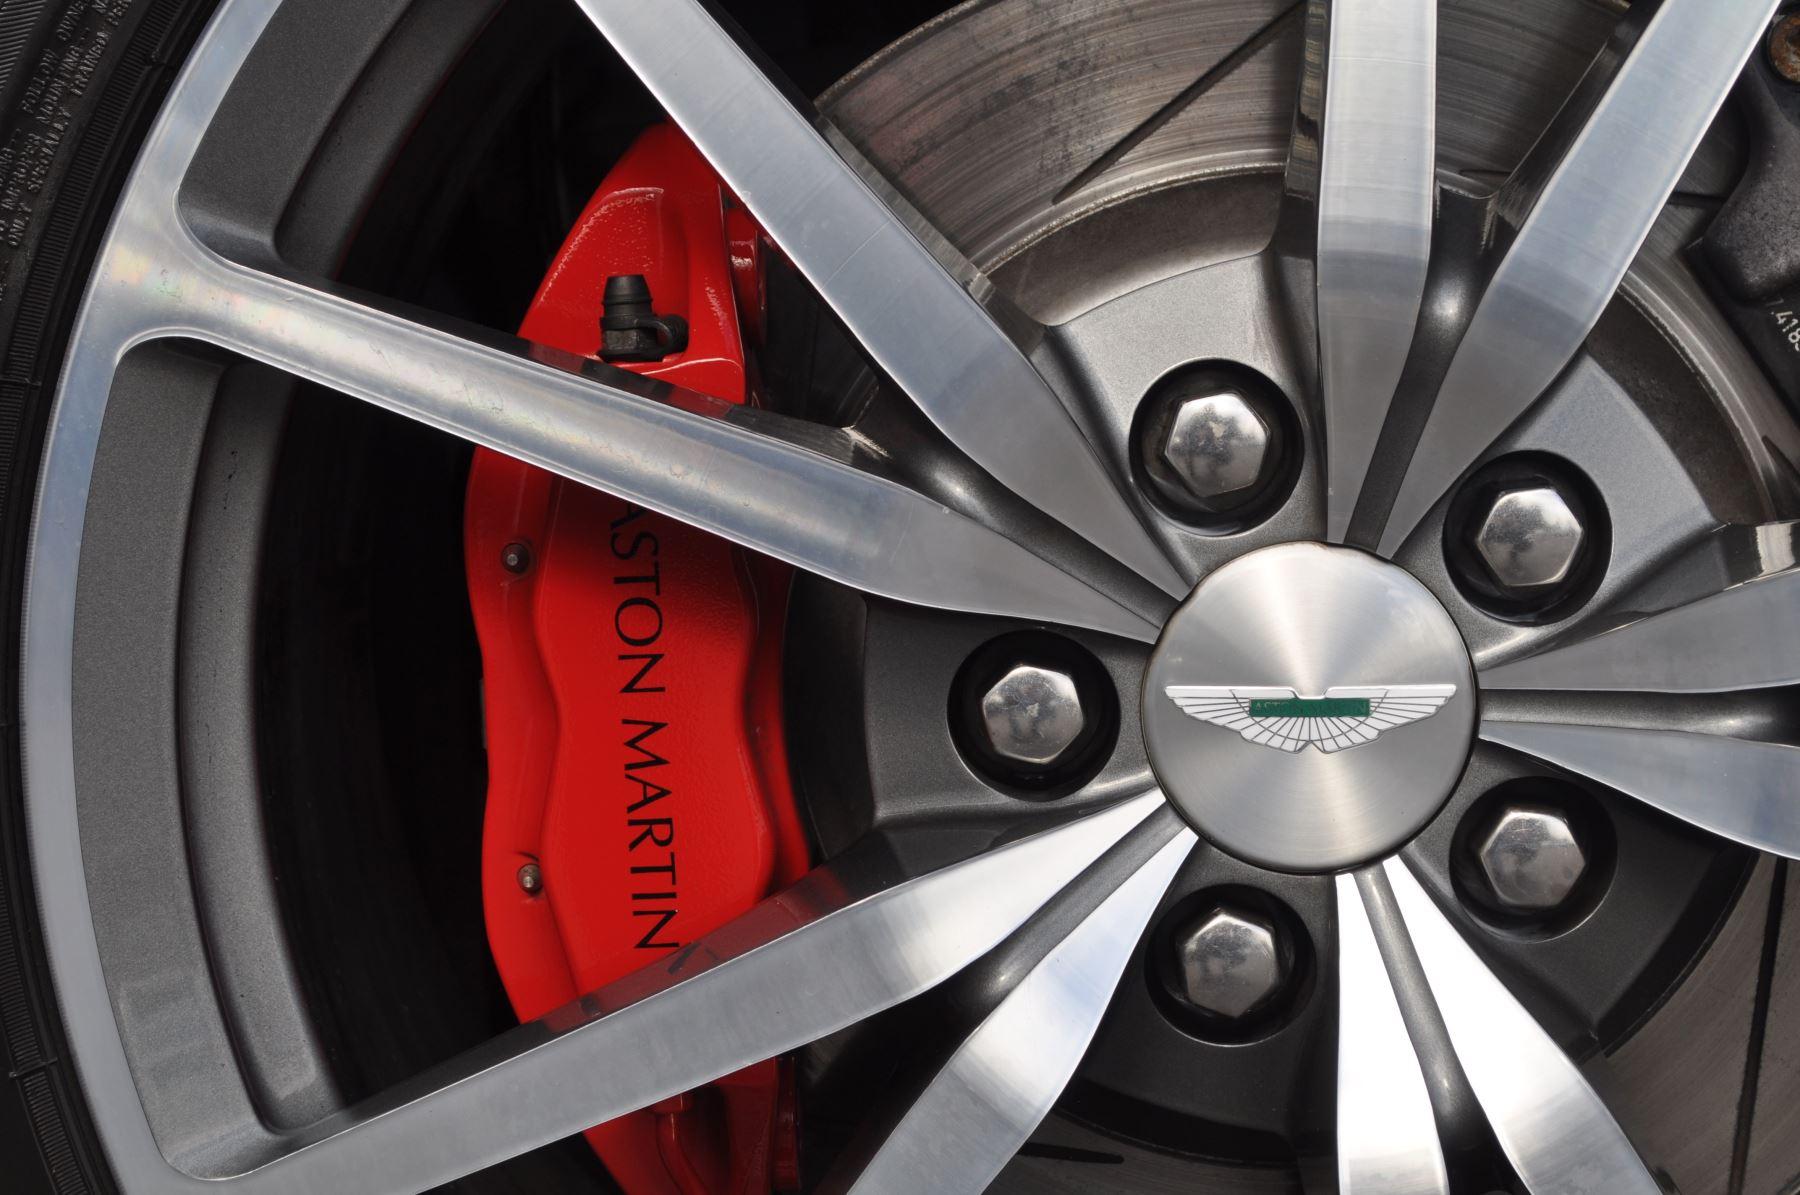 Aston Martin V8 Vantage S Coupe Coupe image 40